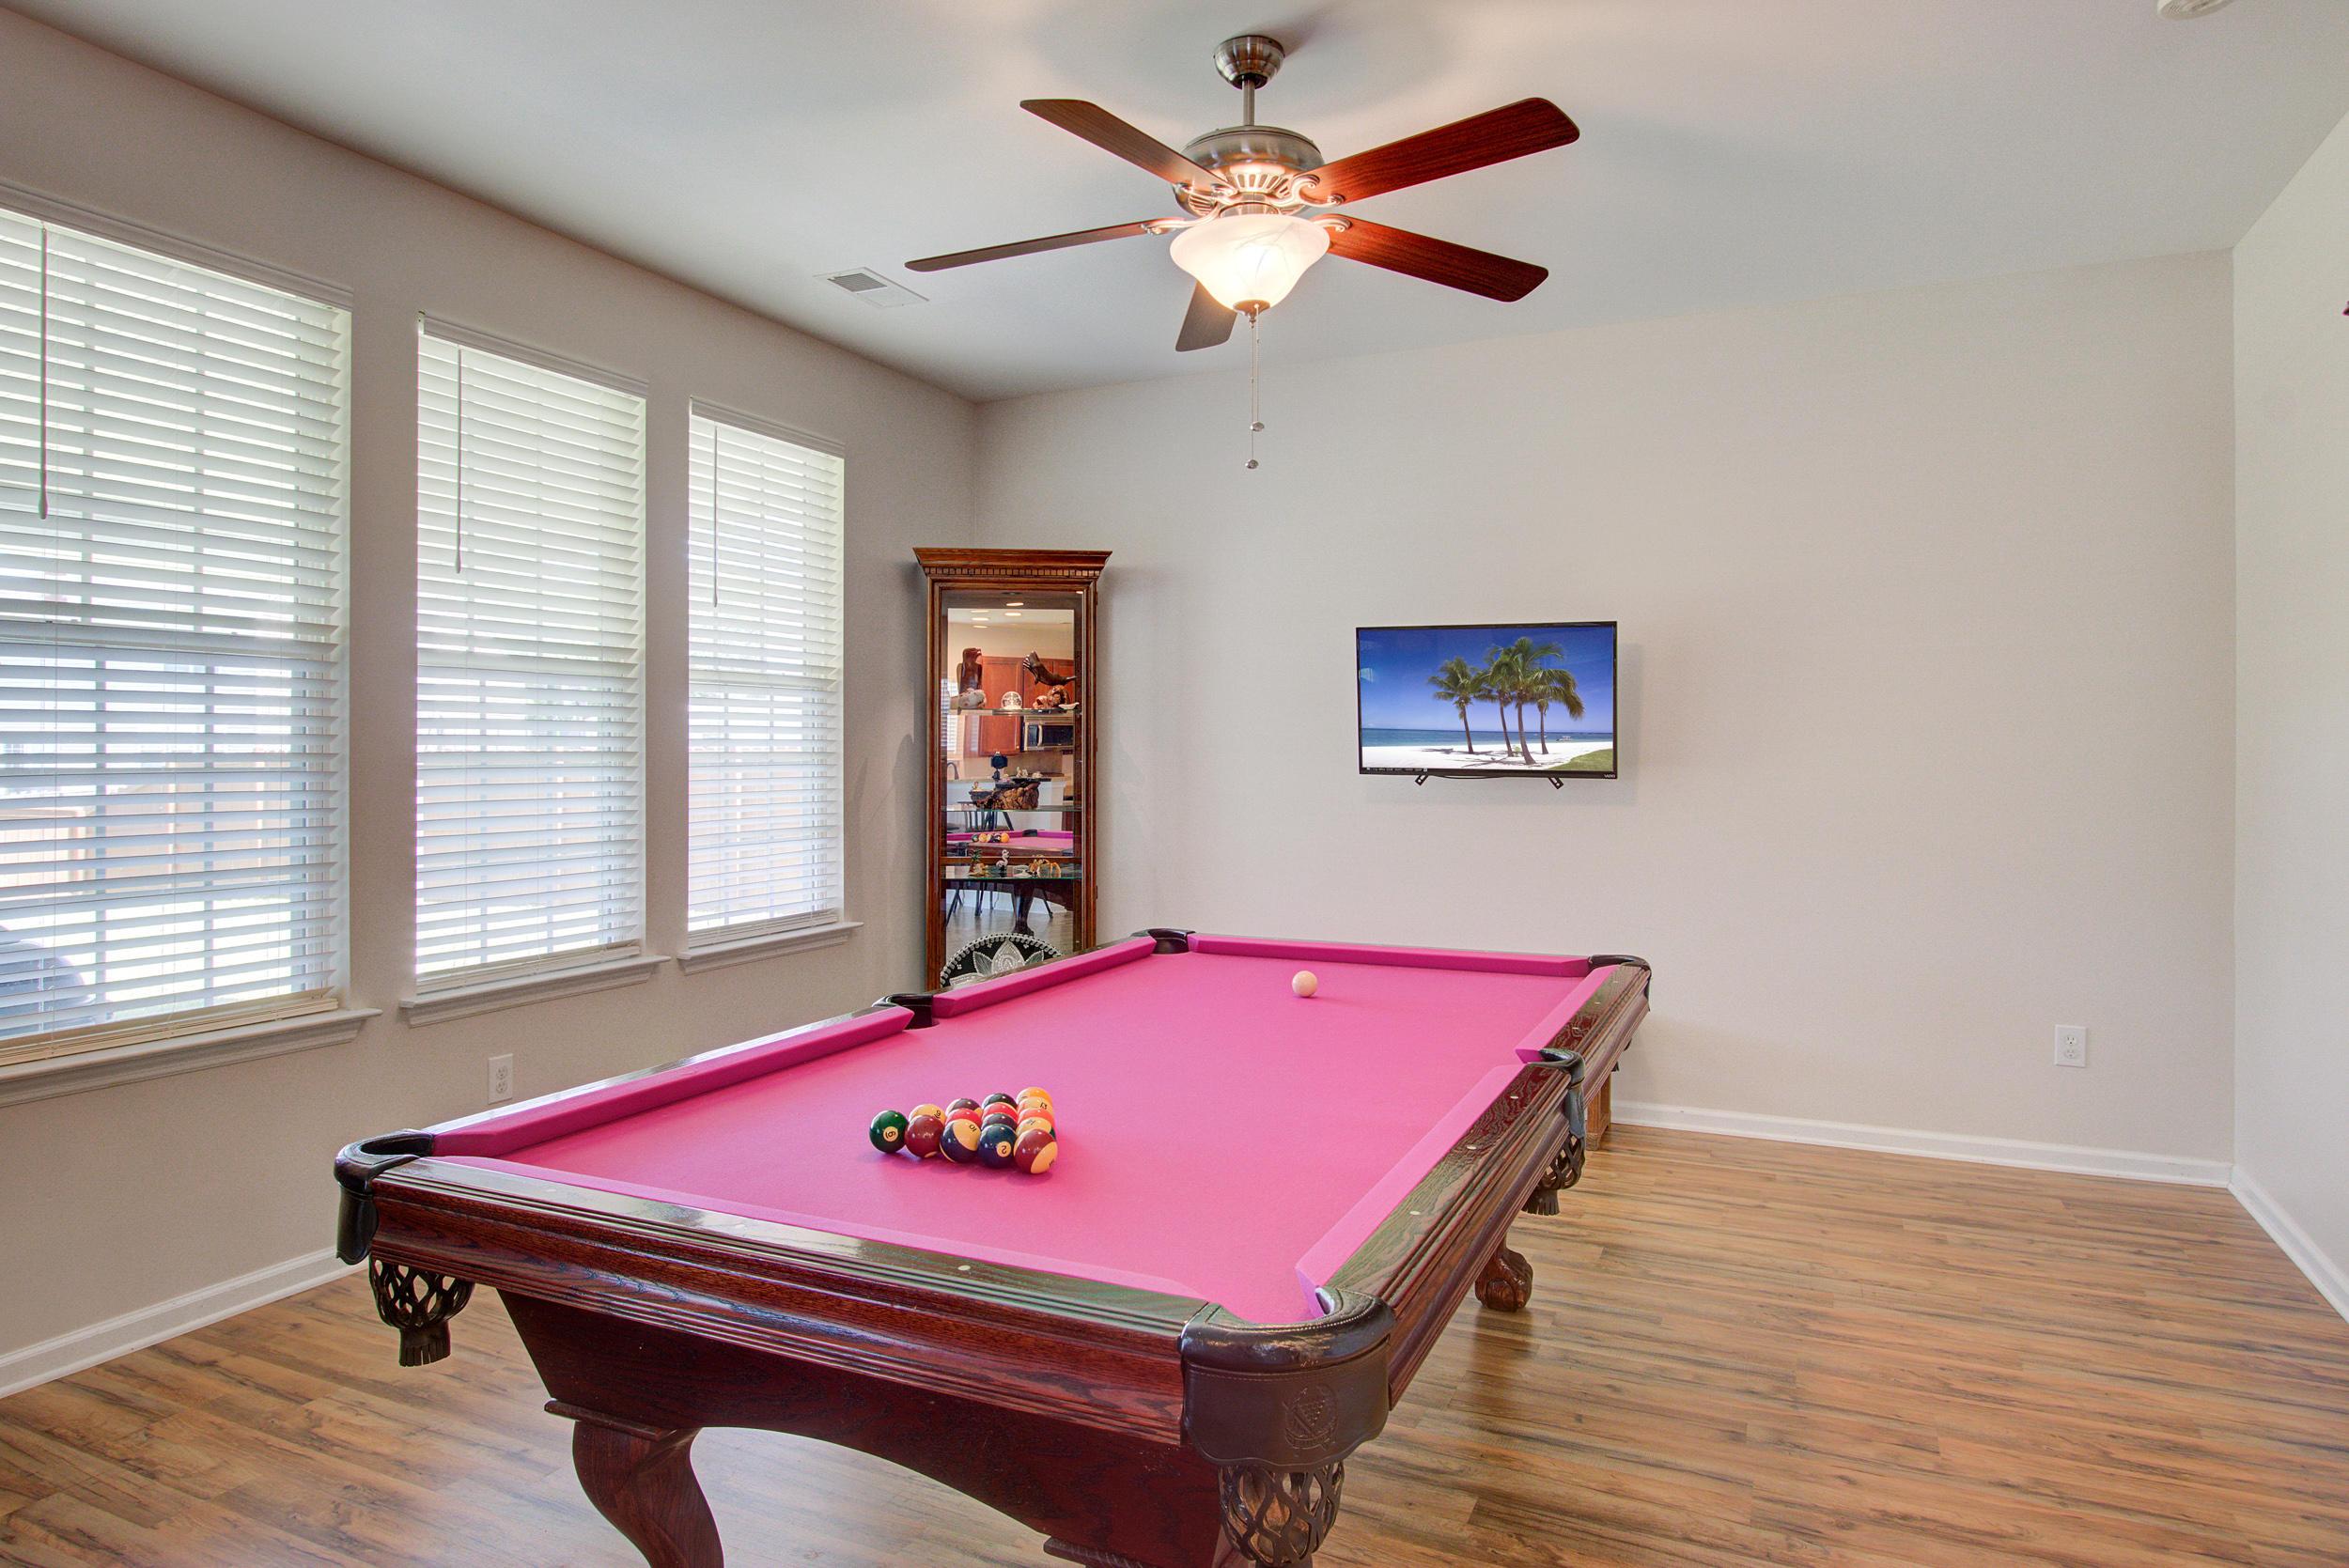 Oakley Pointe Homes For Sale - 576 English Oak, Moncks Corner, SC - 55